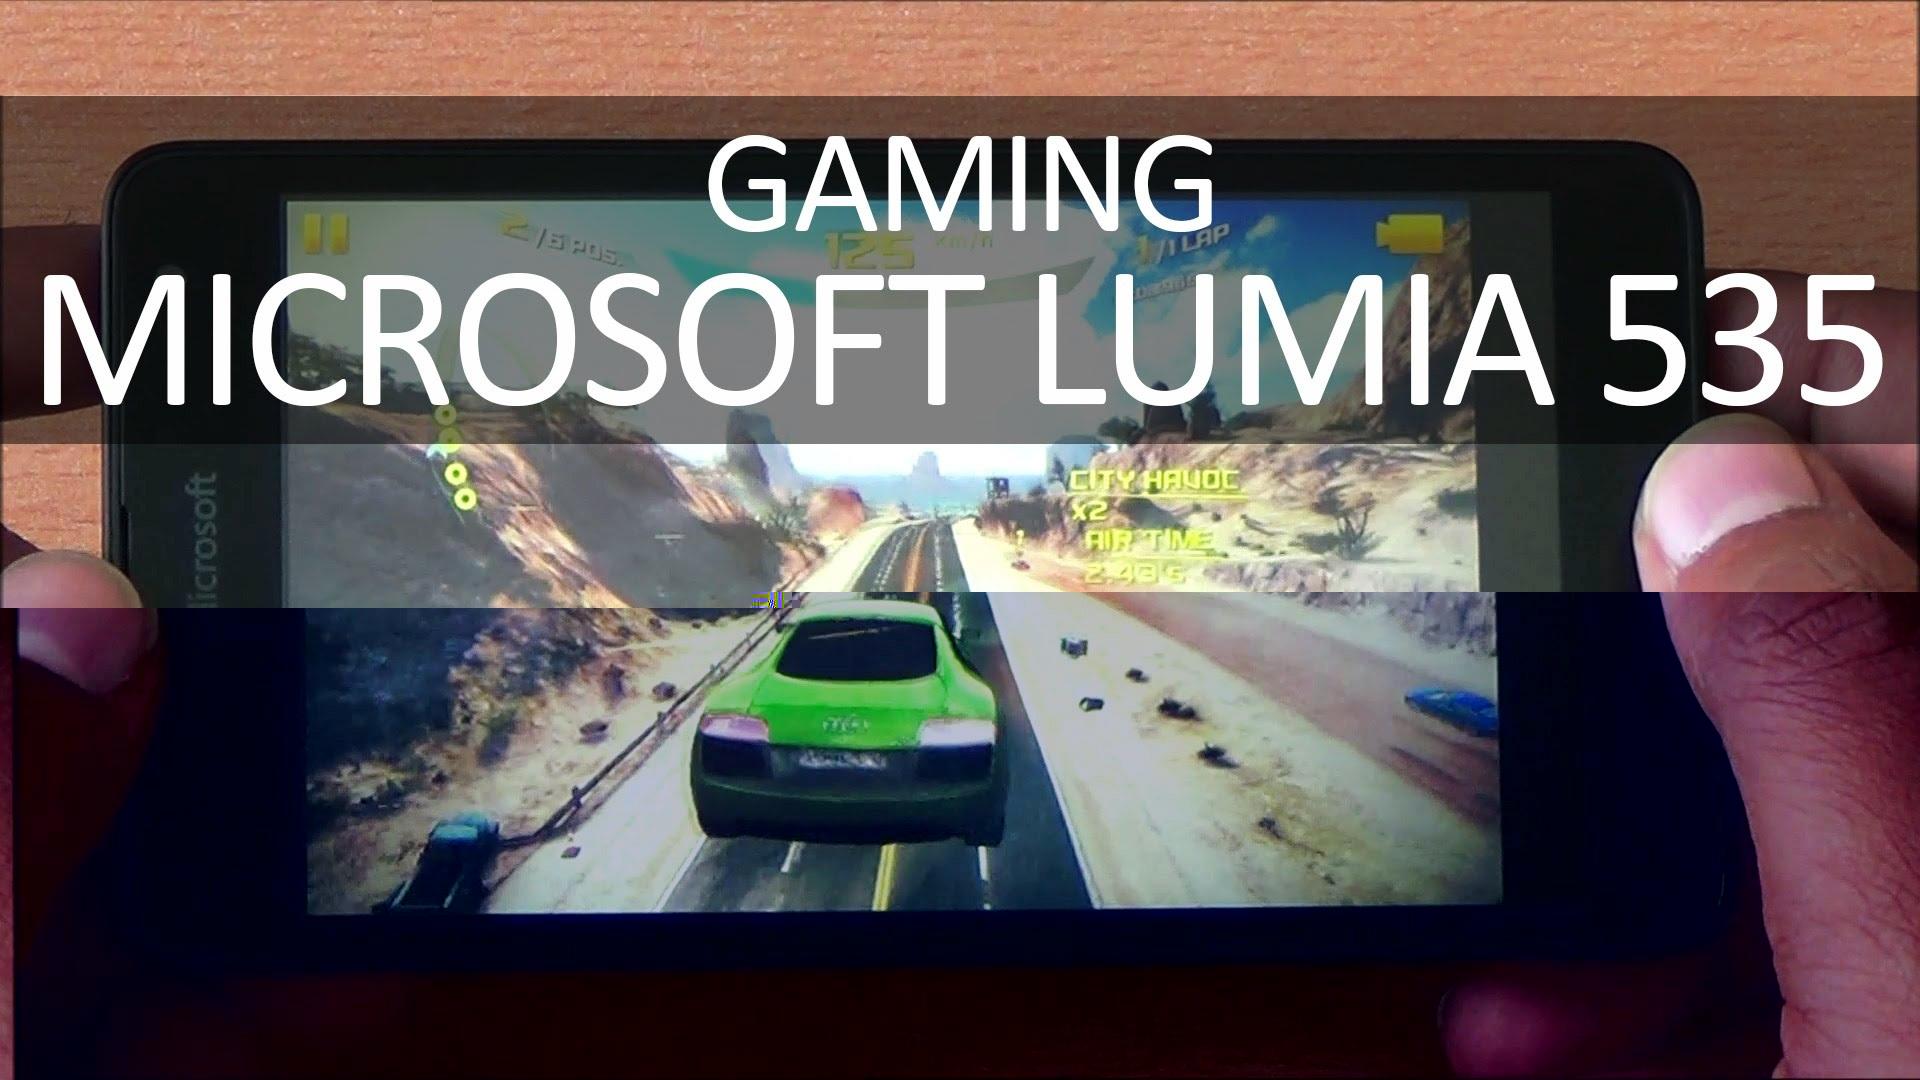 Microsoft-Lumia-535-tam-biet-thuong-hieu-huyen-thoai-Nokia